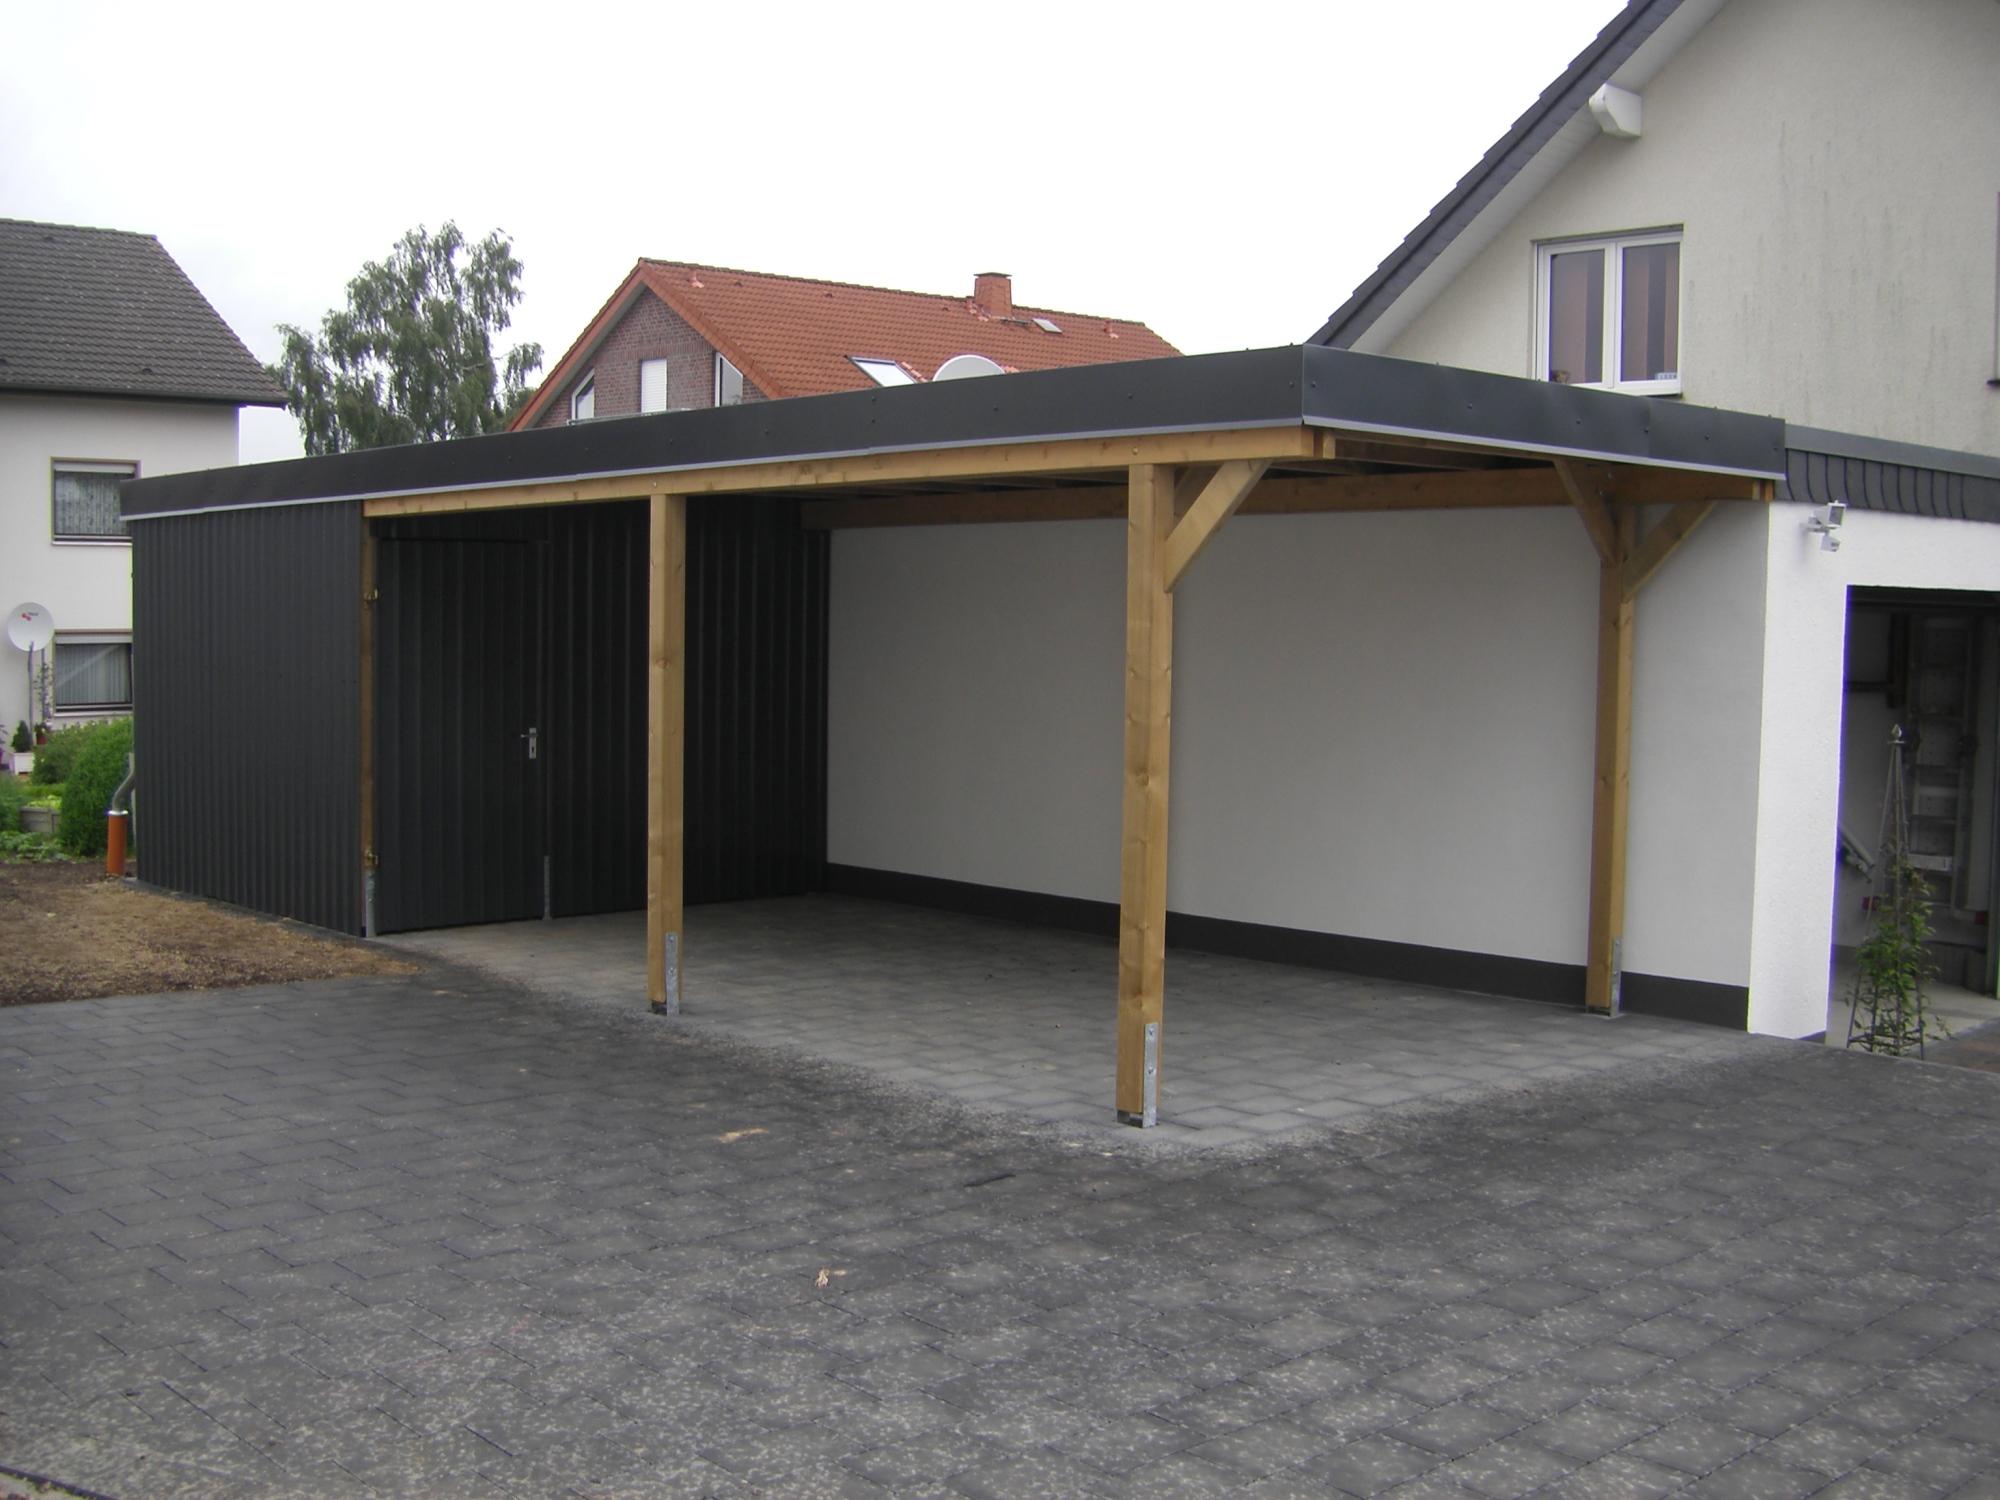 carport verkleidung holz beautiful carport verkleidung holz with carport verkleidung holz dach. Black Bedroom Furniture Sets. Home Design Ideas